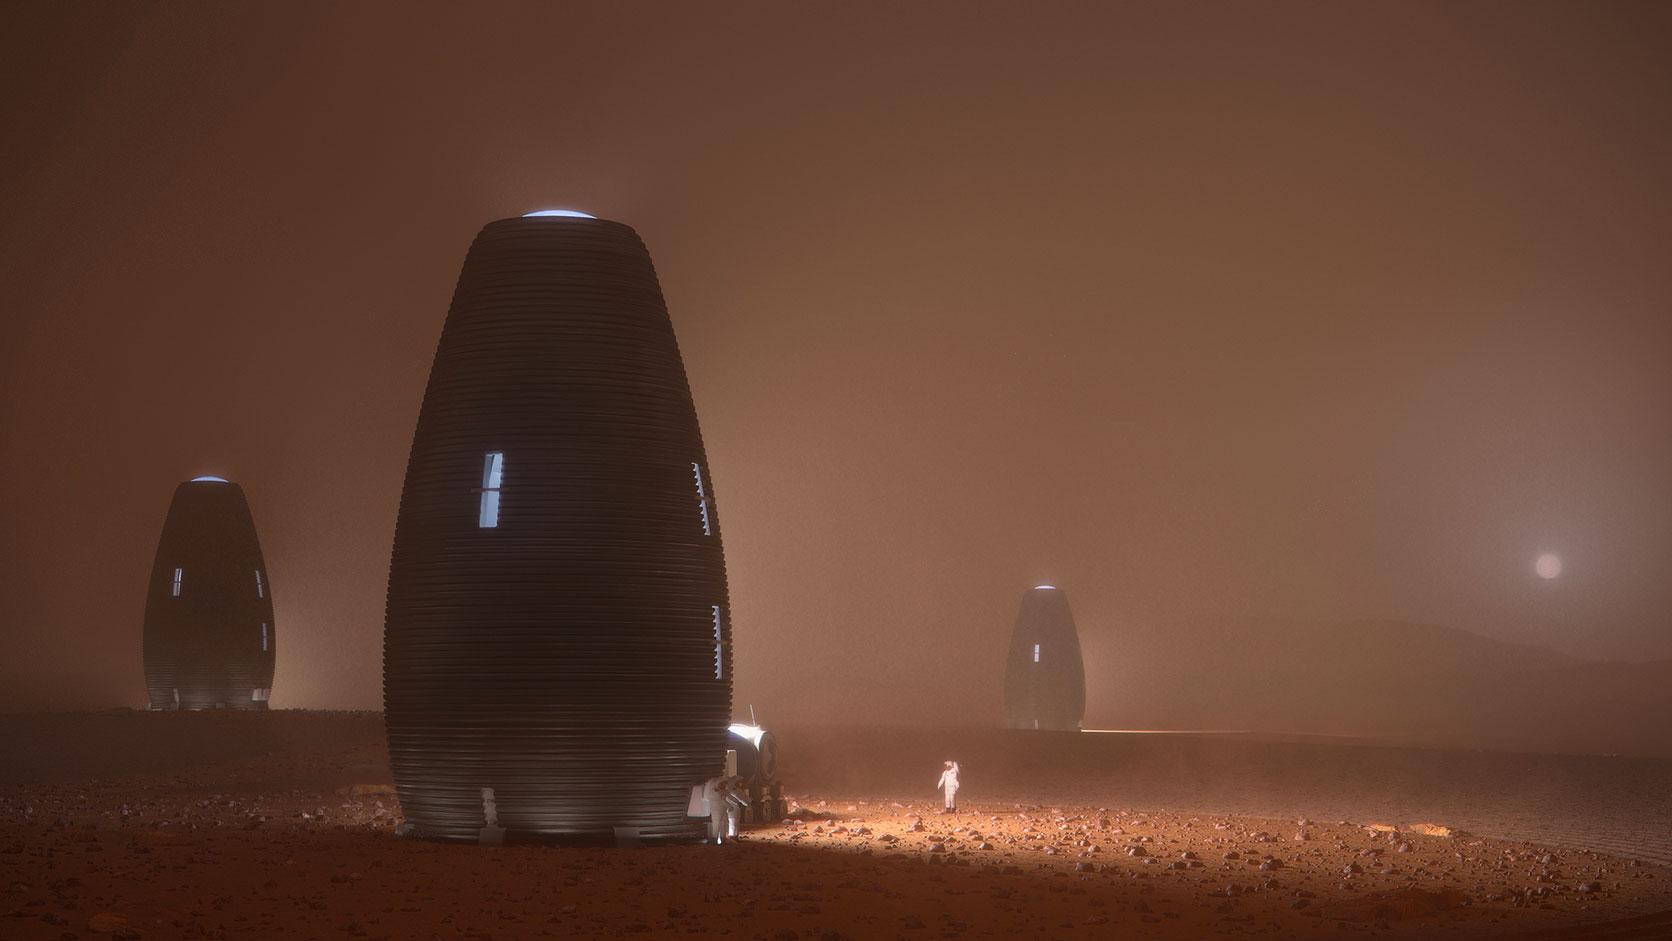 À quoi ressembleront les futurs humains de Mars?